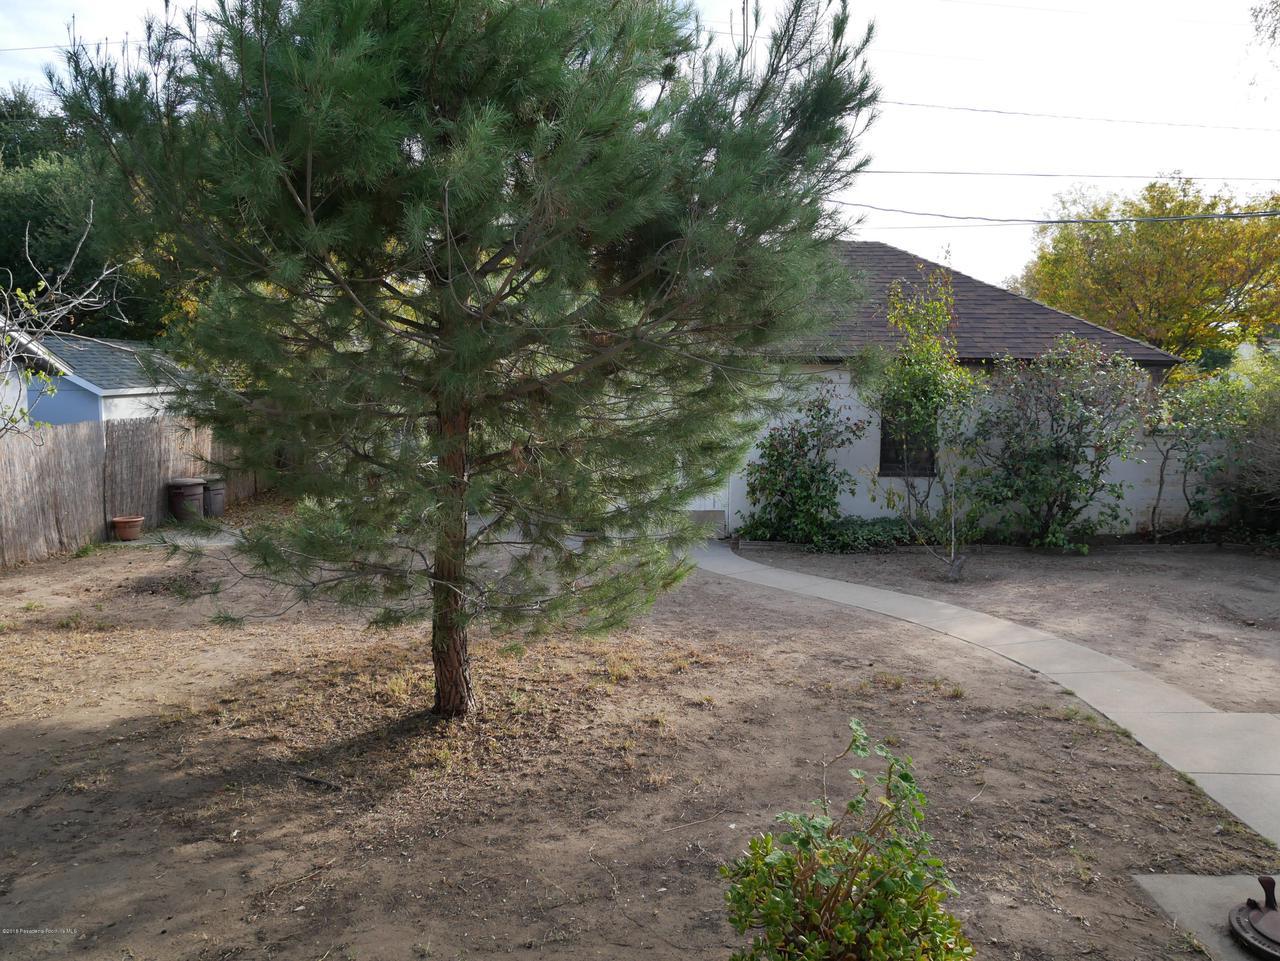 2432 ORANGE GROVE, Pasadena, CA 91104 - Back yard 1